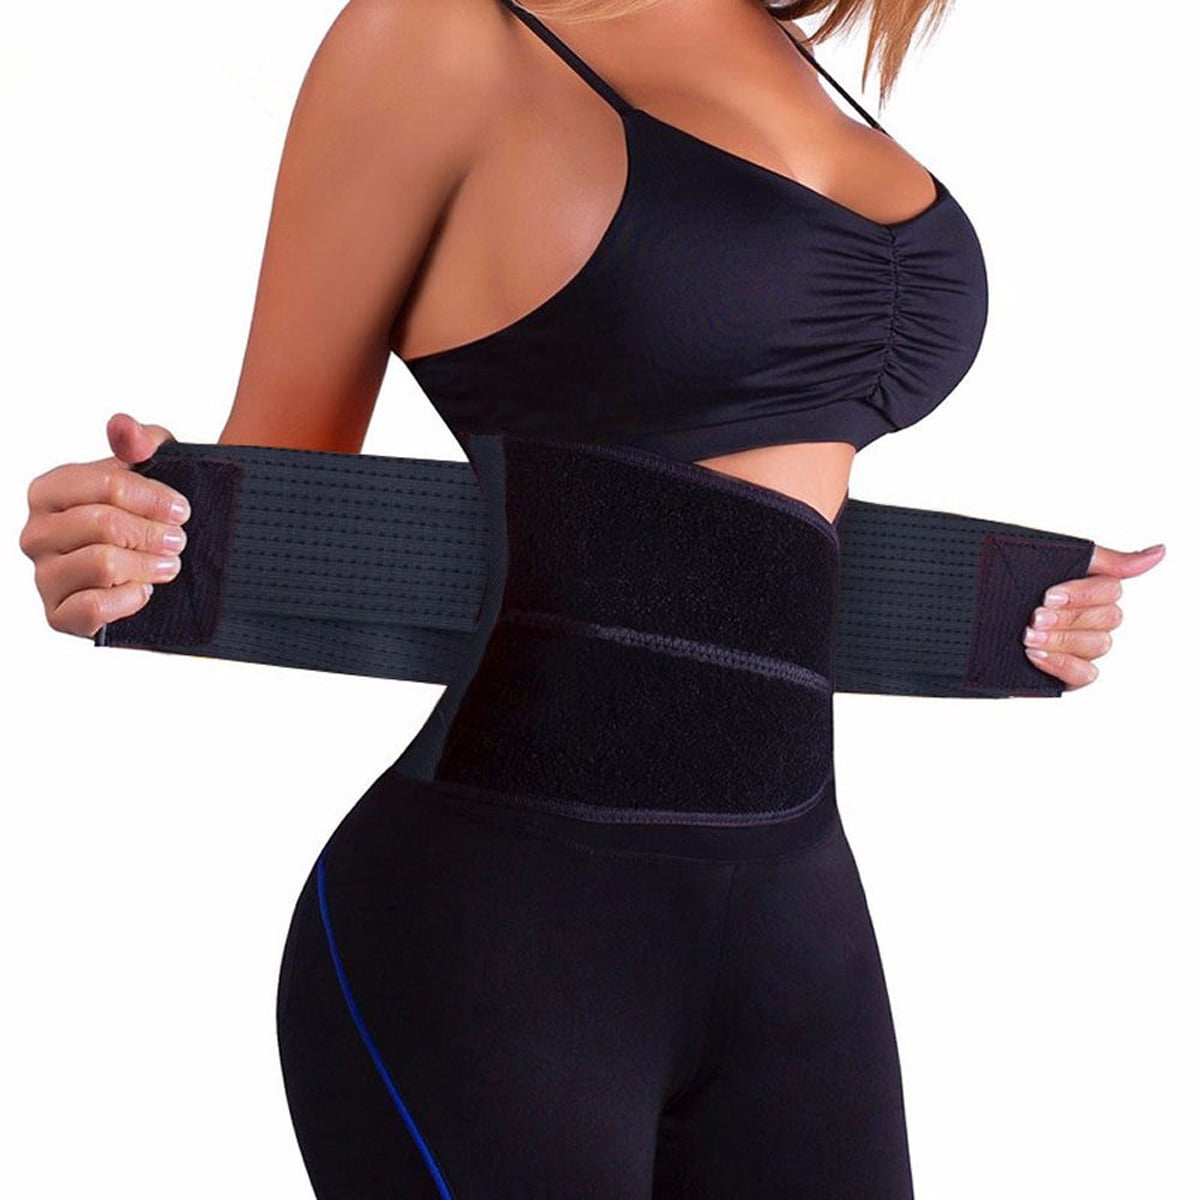 Hot Women Men Trainer Waist Belt Cincher Sports Body Shaper Corset Shapewear New